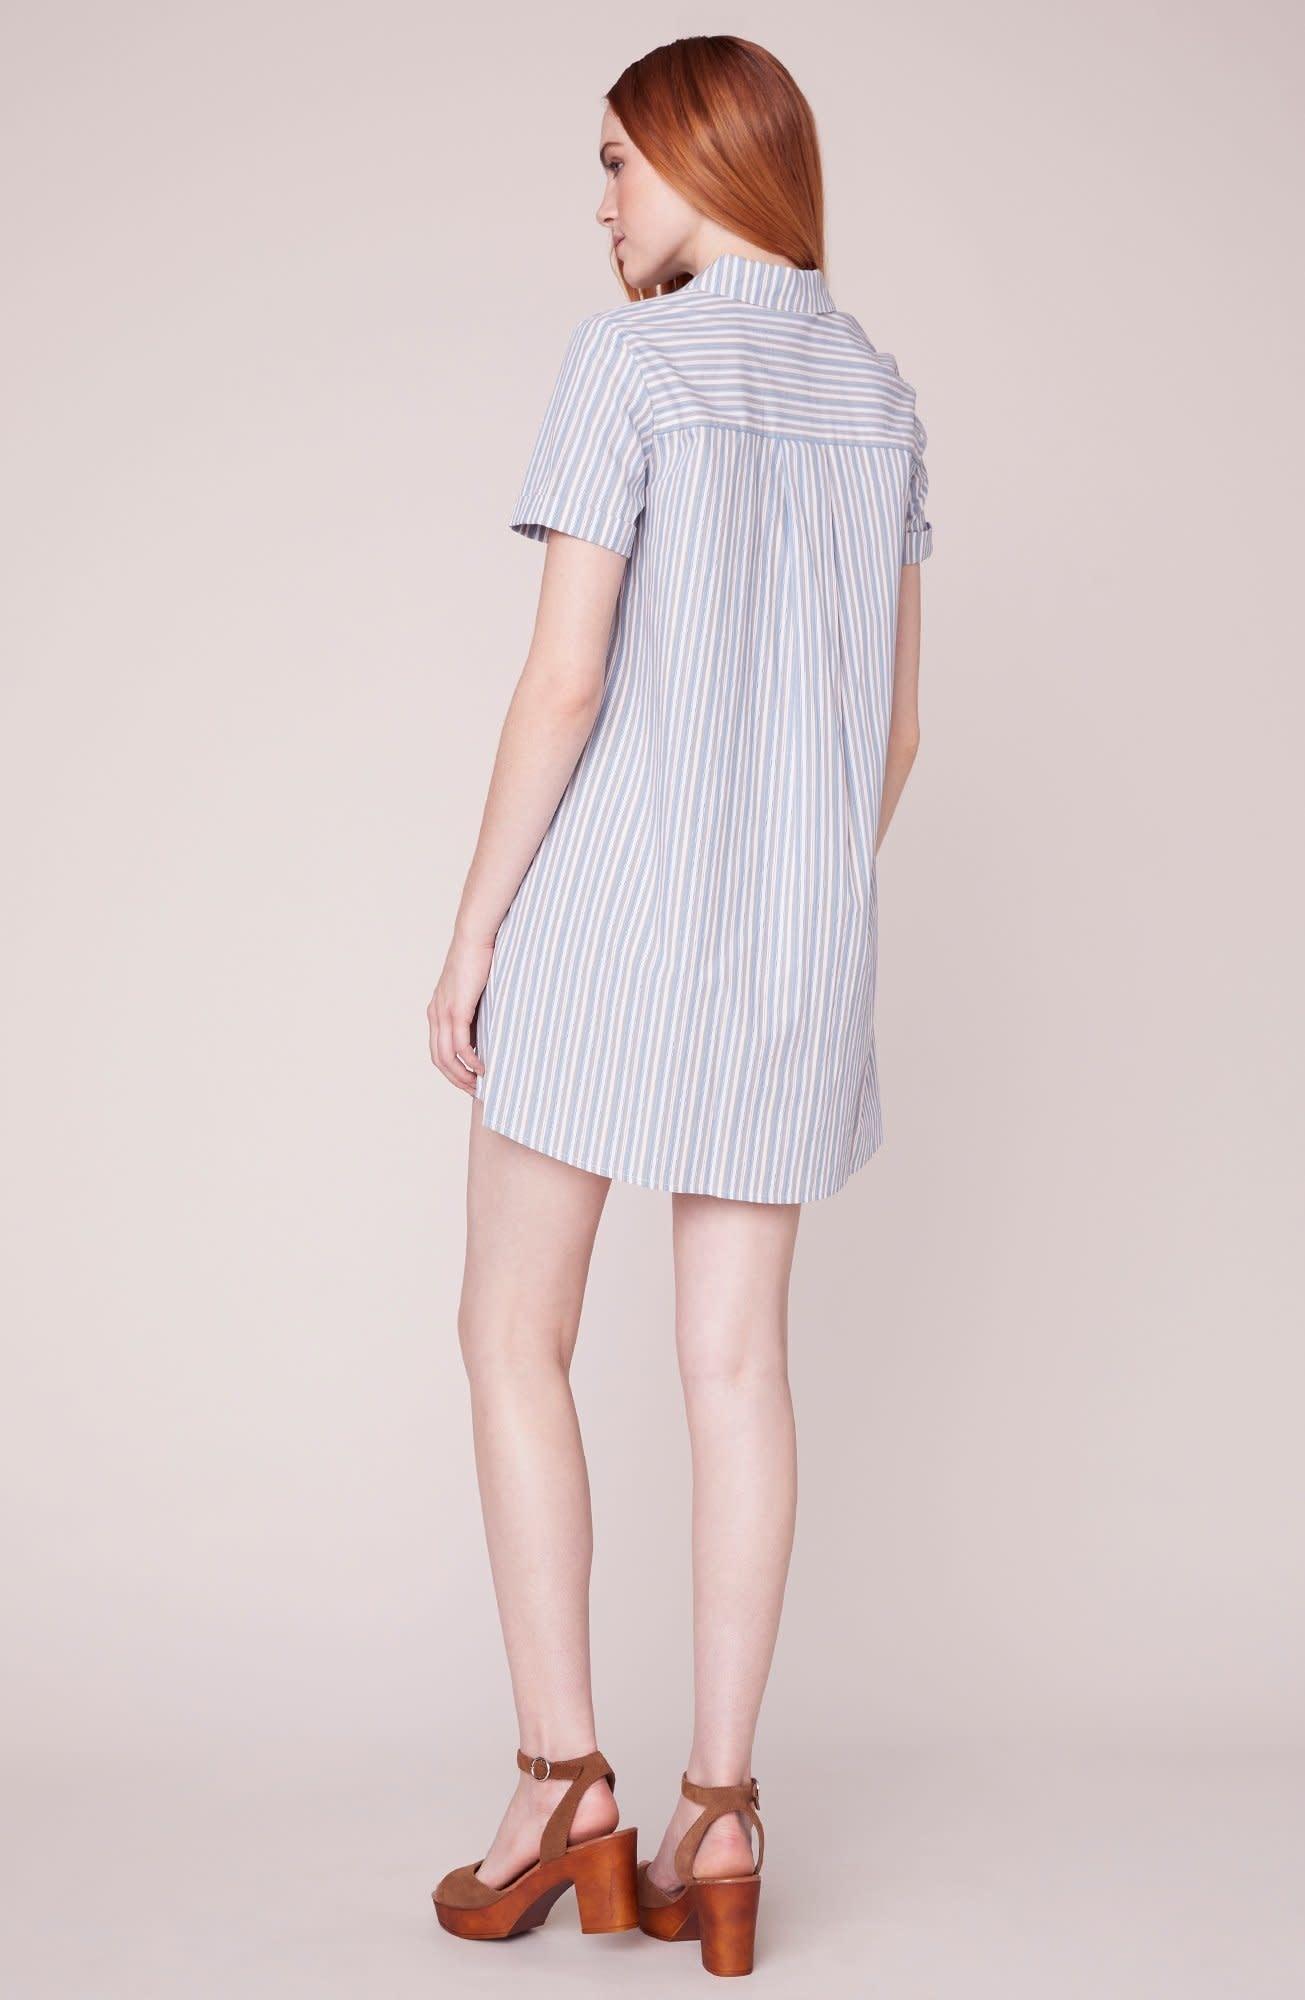 BB Dakota Stripe a Personality Shirt Dress